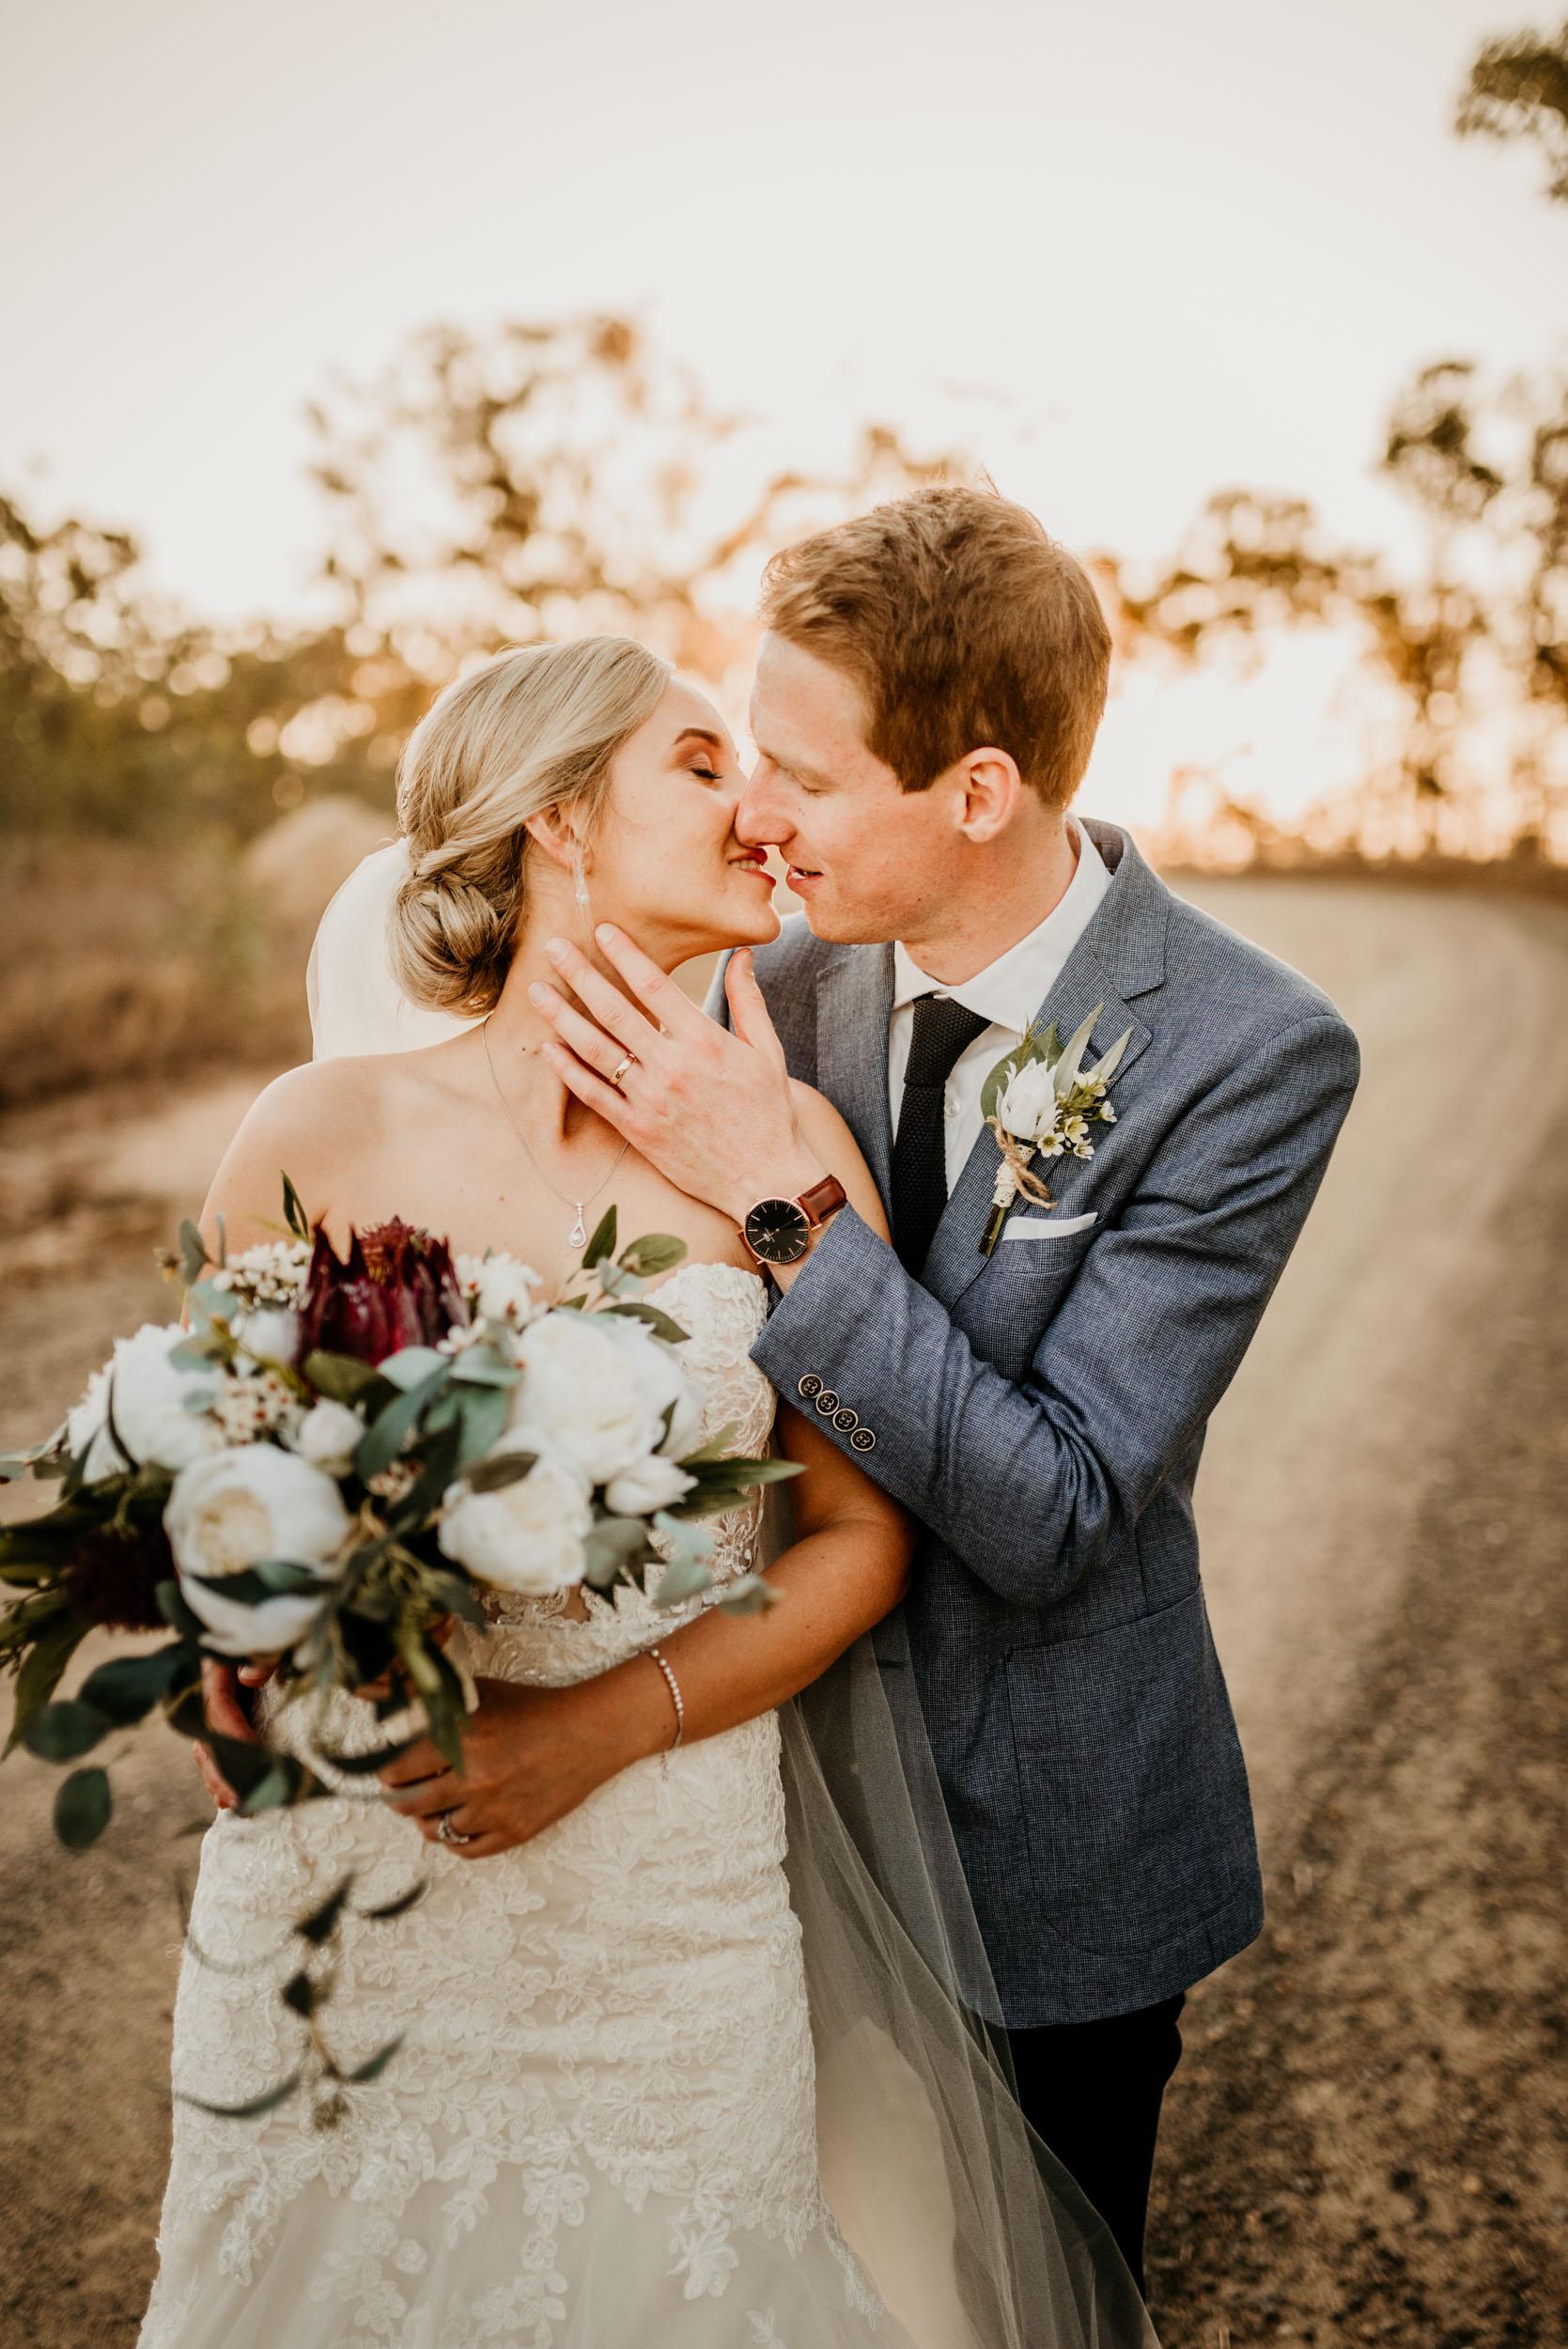 The Raw Photographer - Cairns and Port Douglas Wedding Photographer - Best of 2018-34.jpg